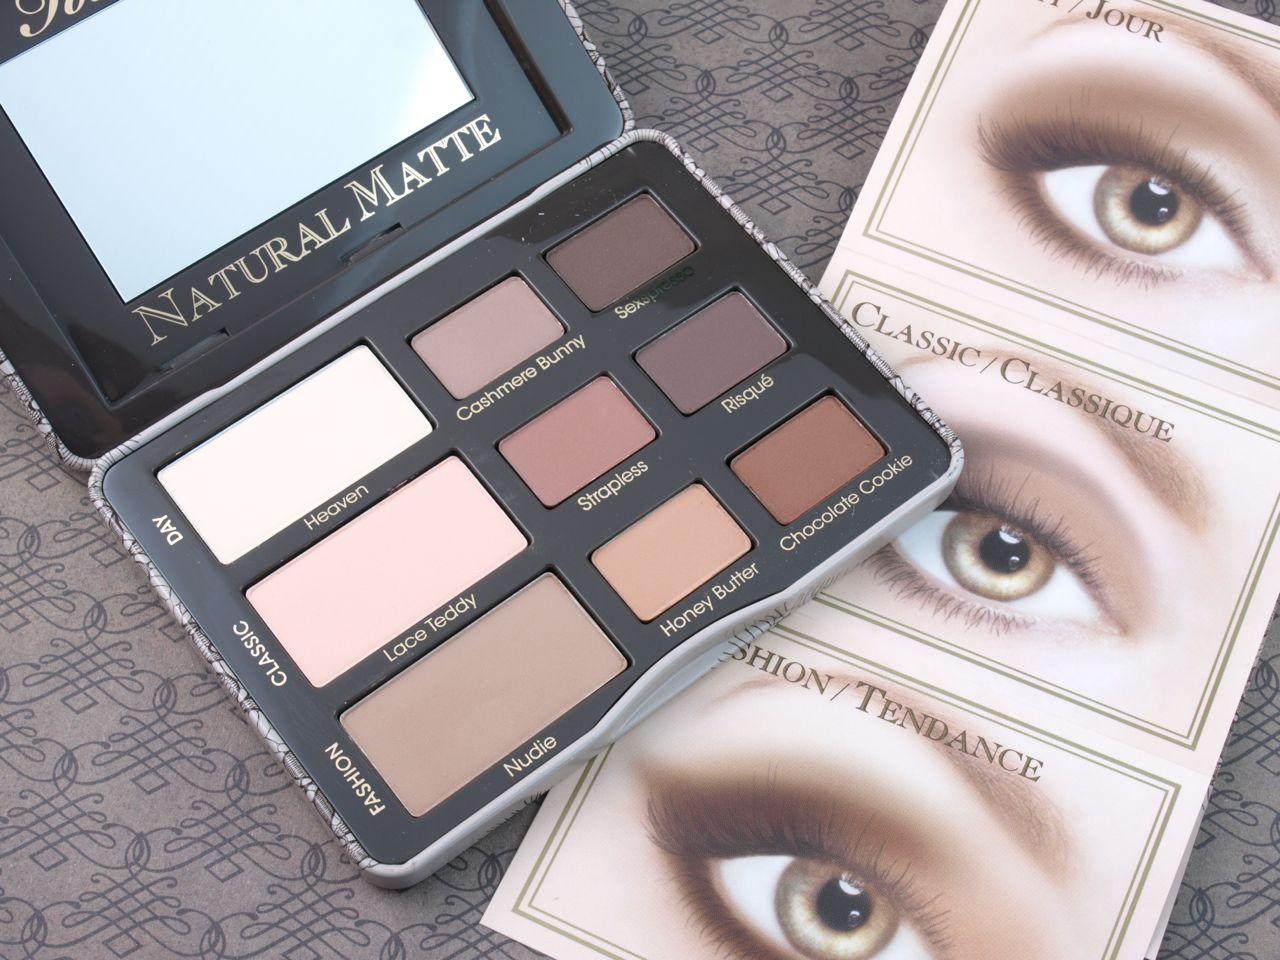 Too Faced Natural Eyes Vs Natural Matte